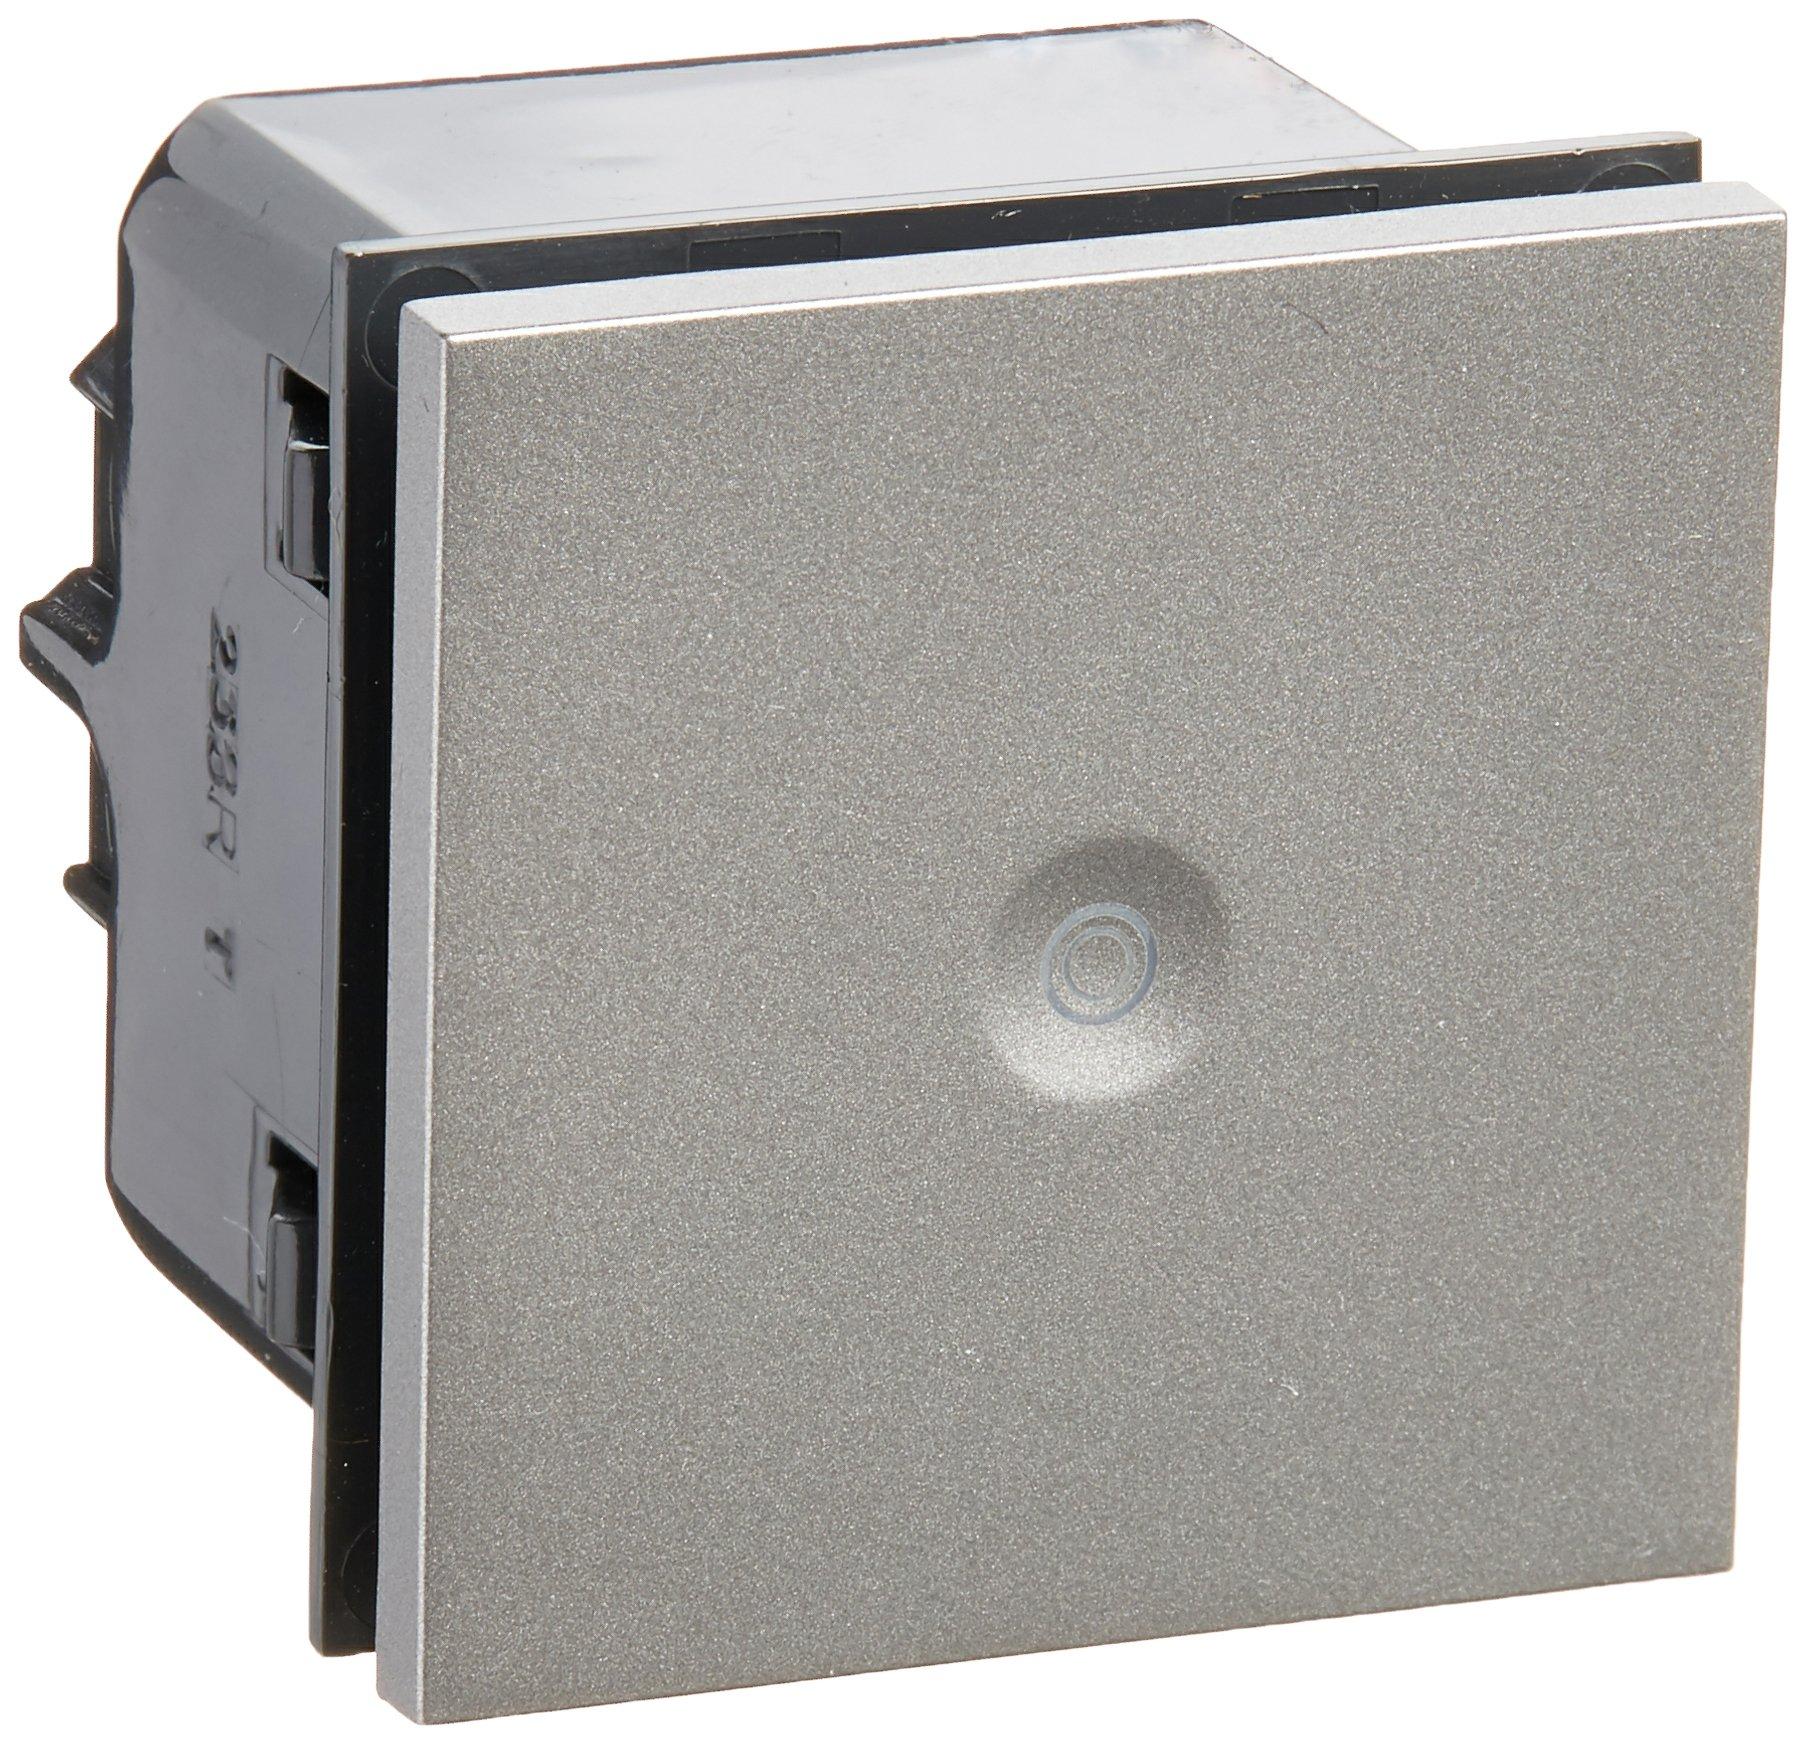 PASS & SEYMOUR ASPU1532M4 Adorne 15 Amp Magnesium Push Switch